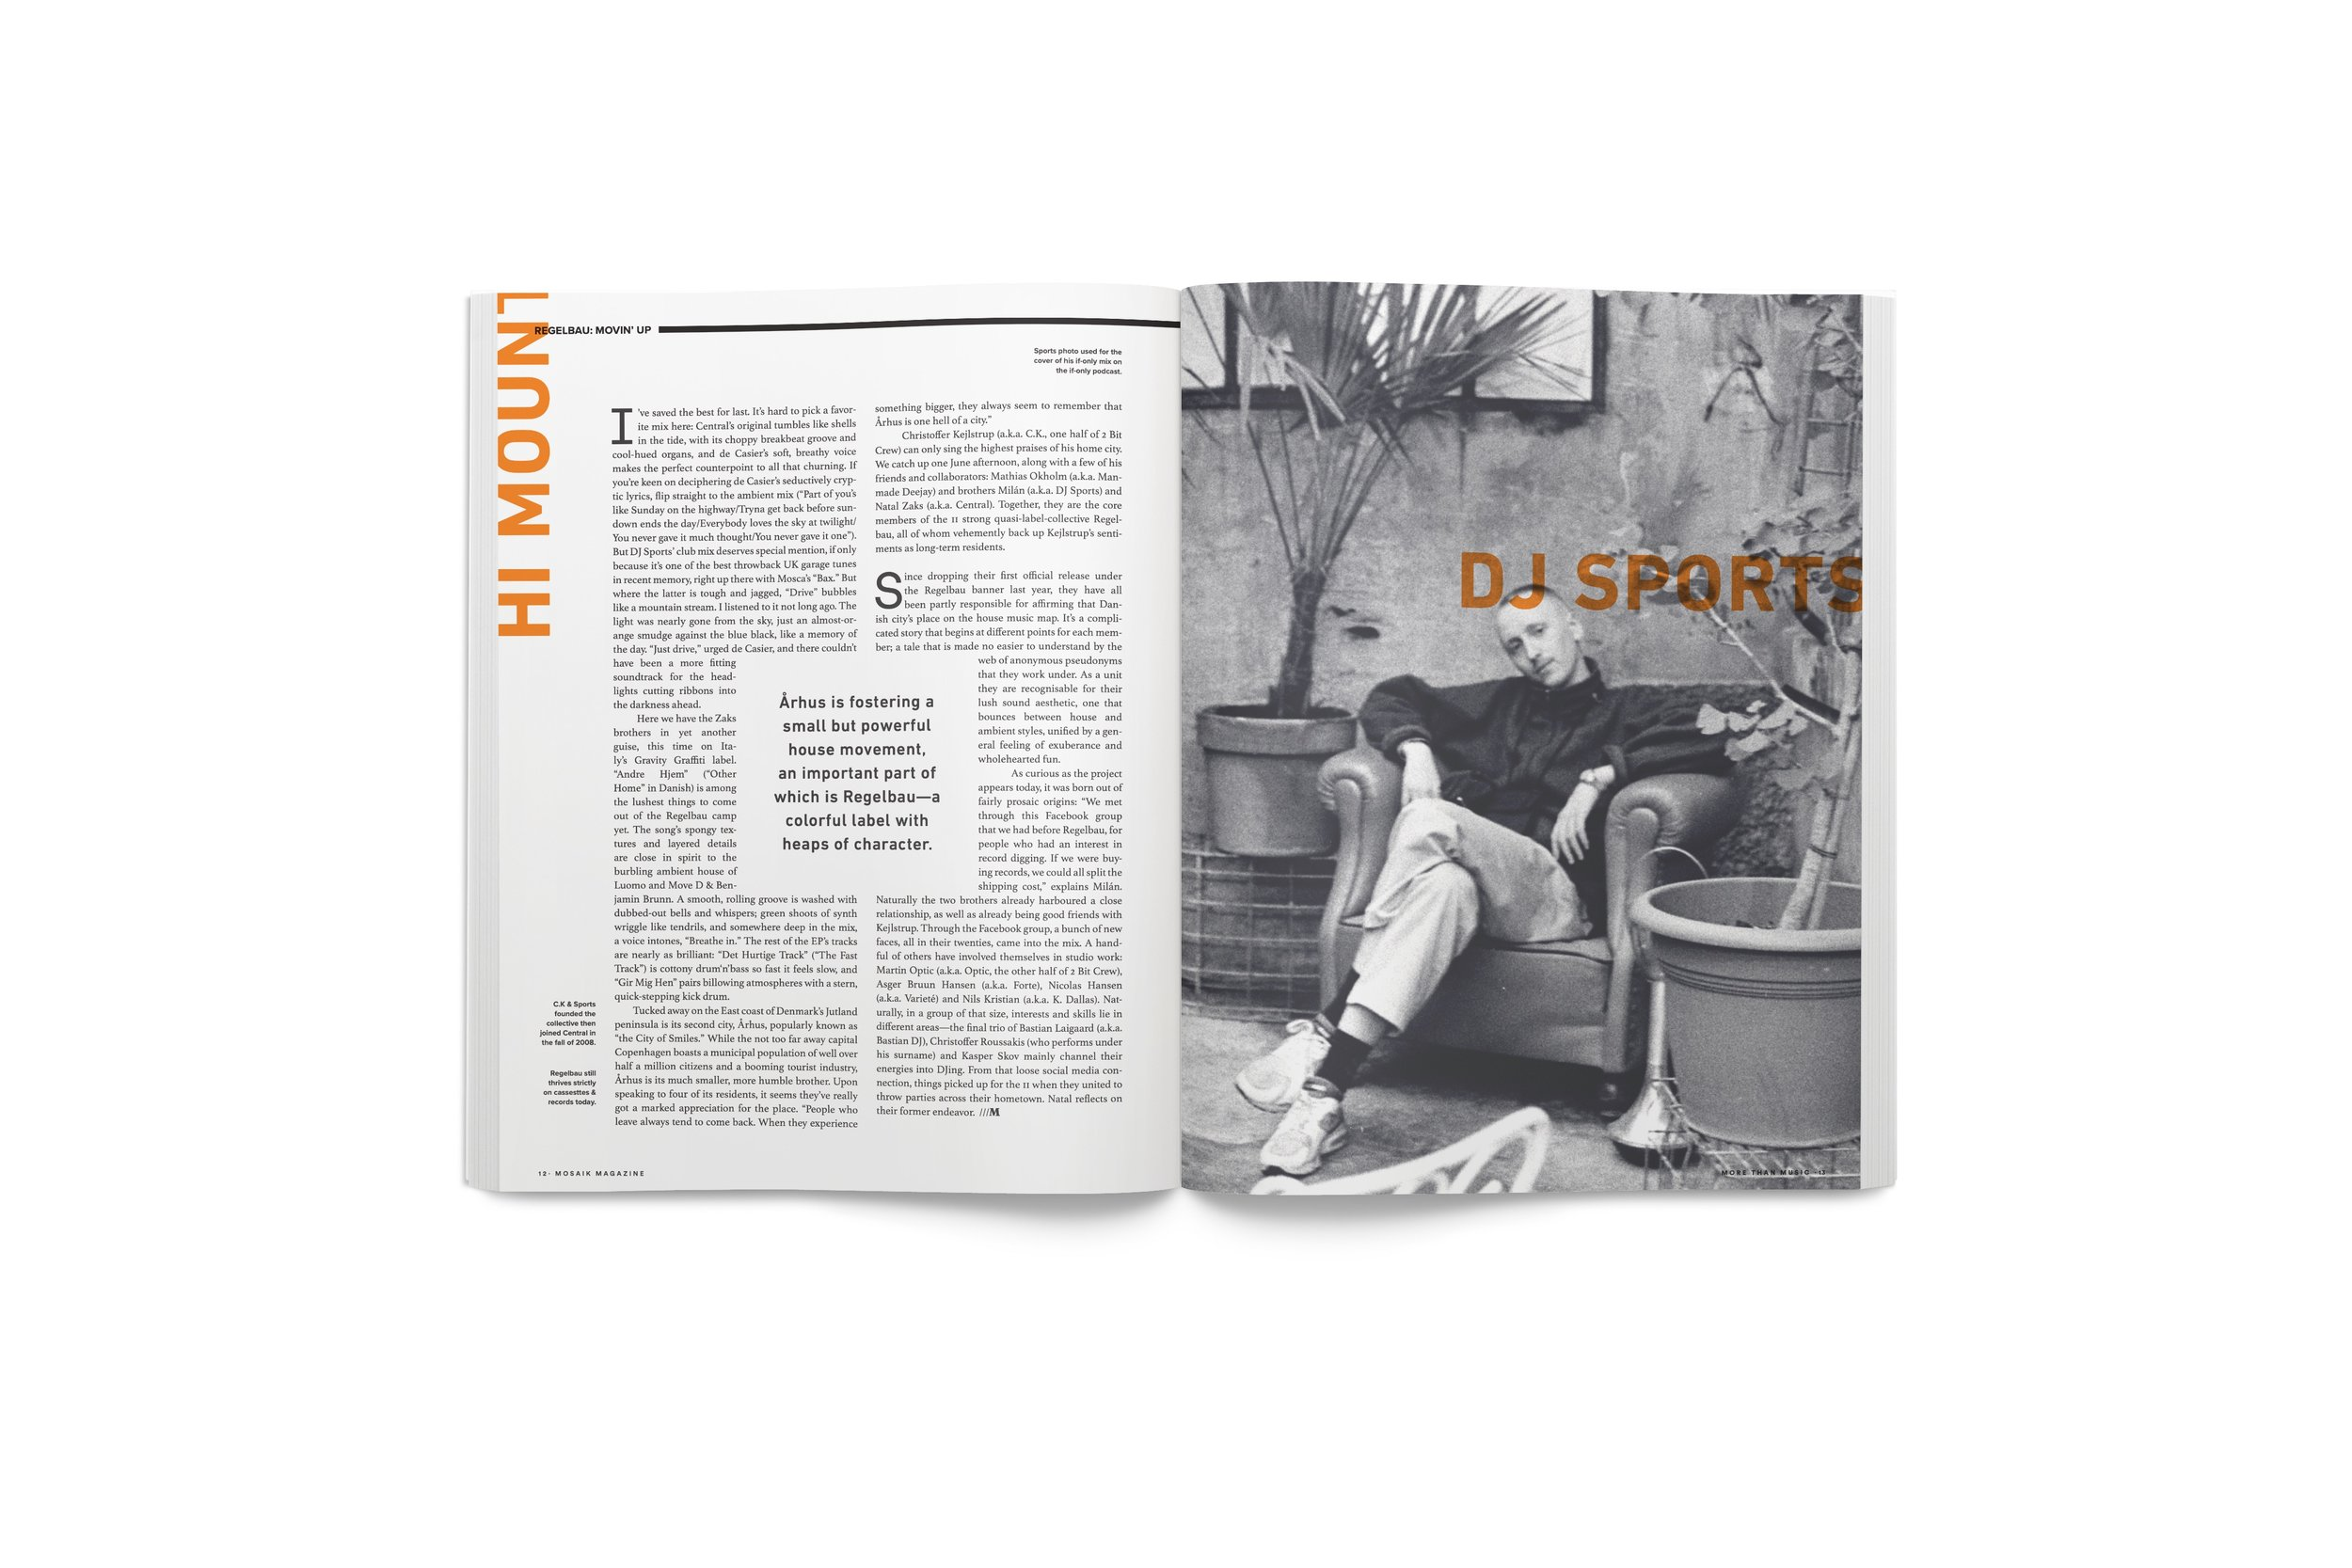 Magazine 0408 2019-03-17 copy 4.jpeg